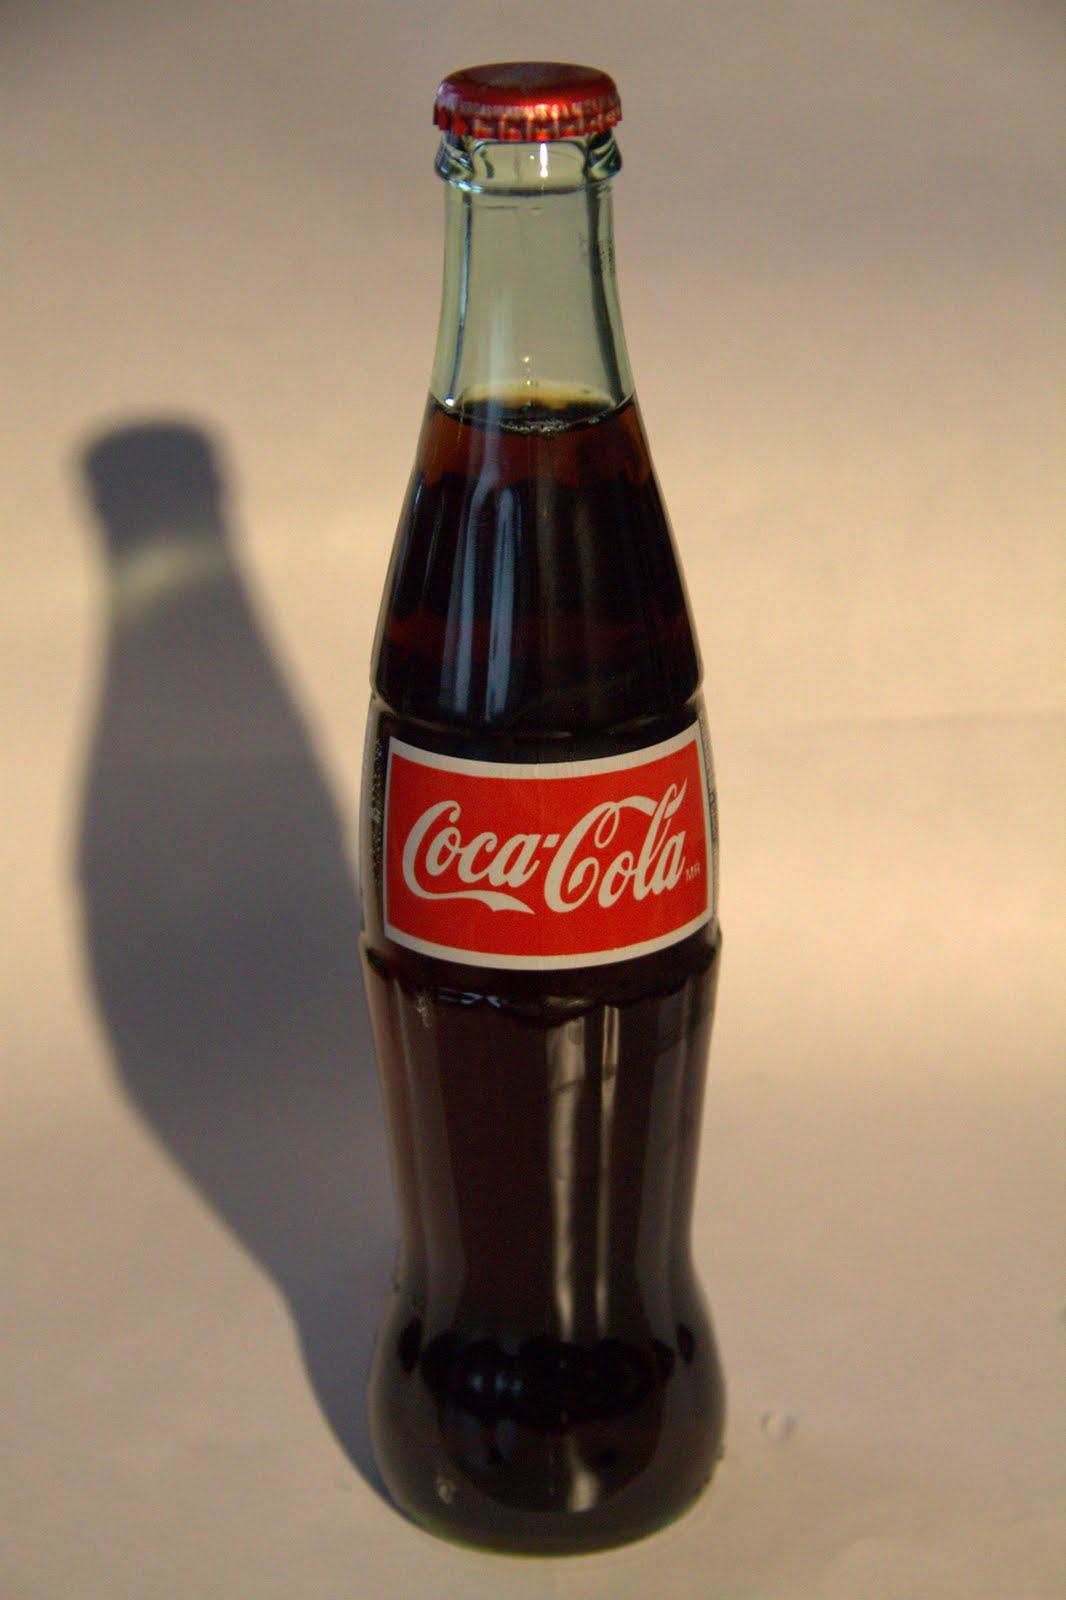 Coke De überraschung